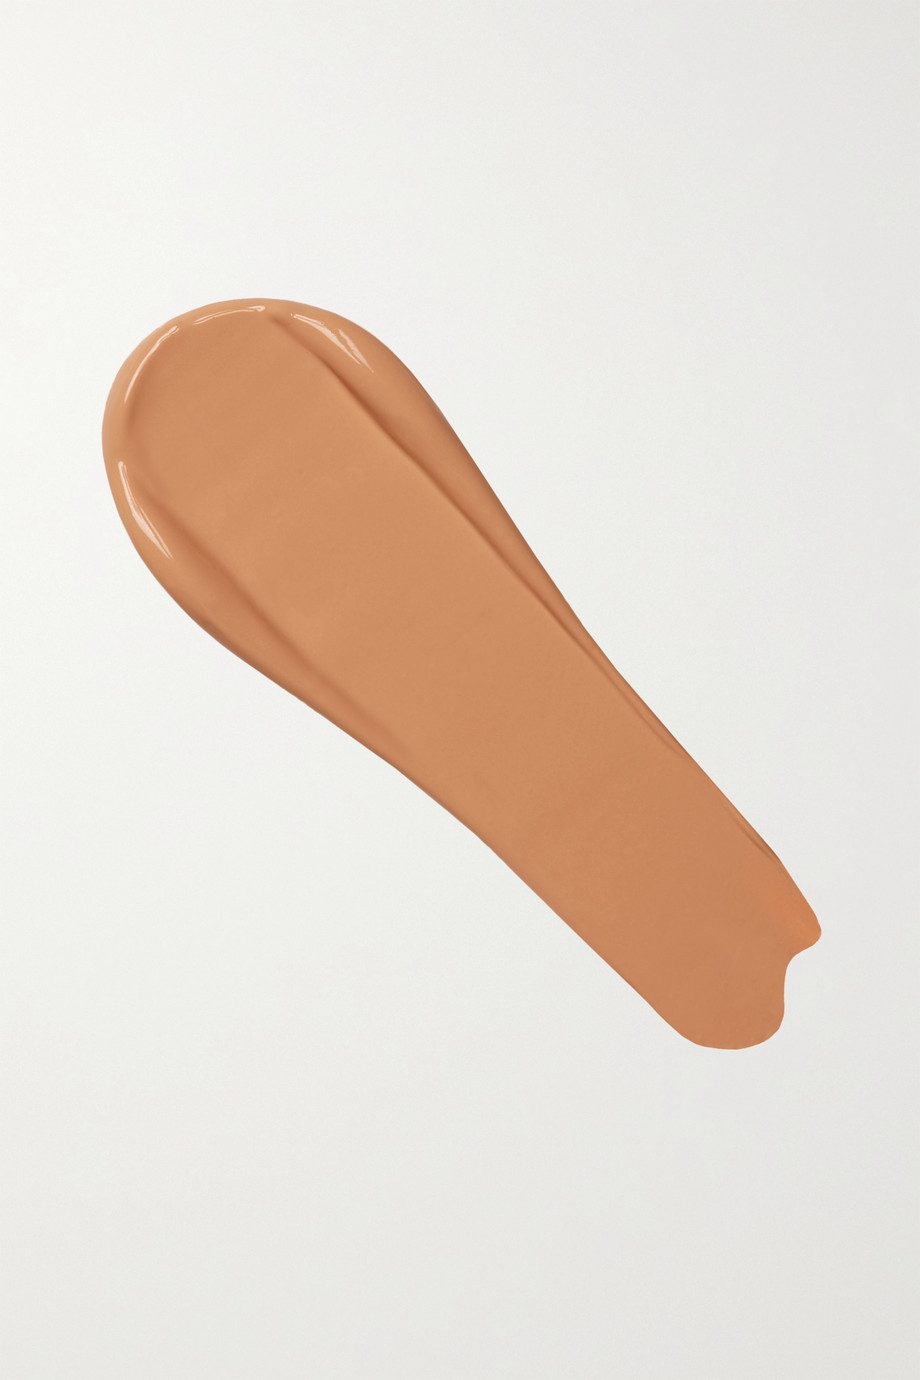 Pat McGrath Labs Skin Fetish: Sublime Perfection Concealer - M17, 5ml